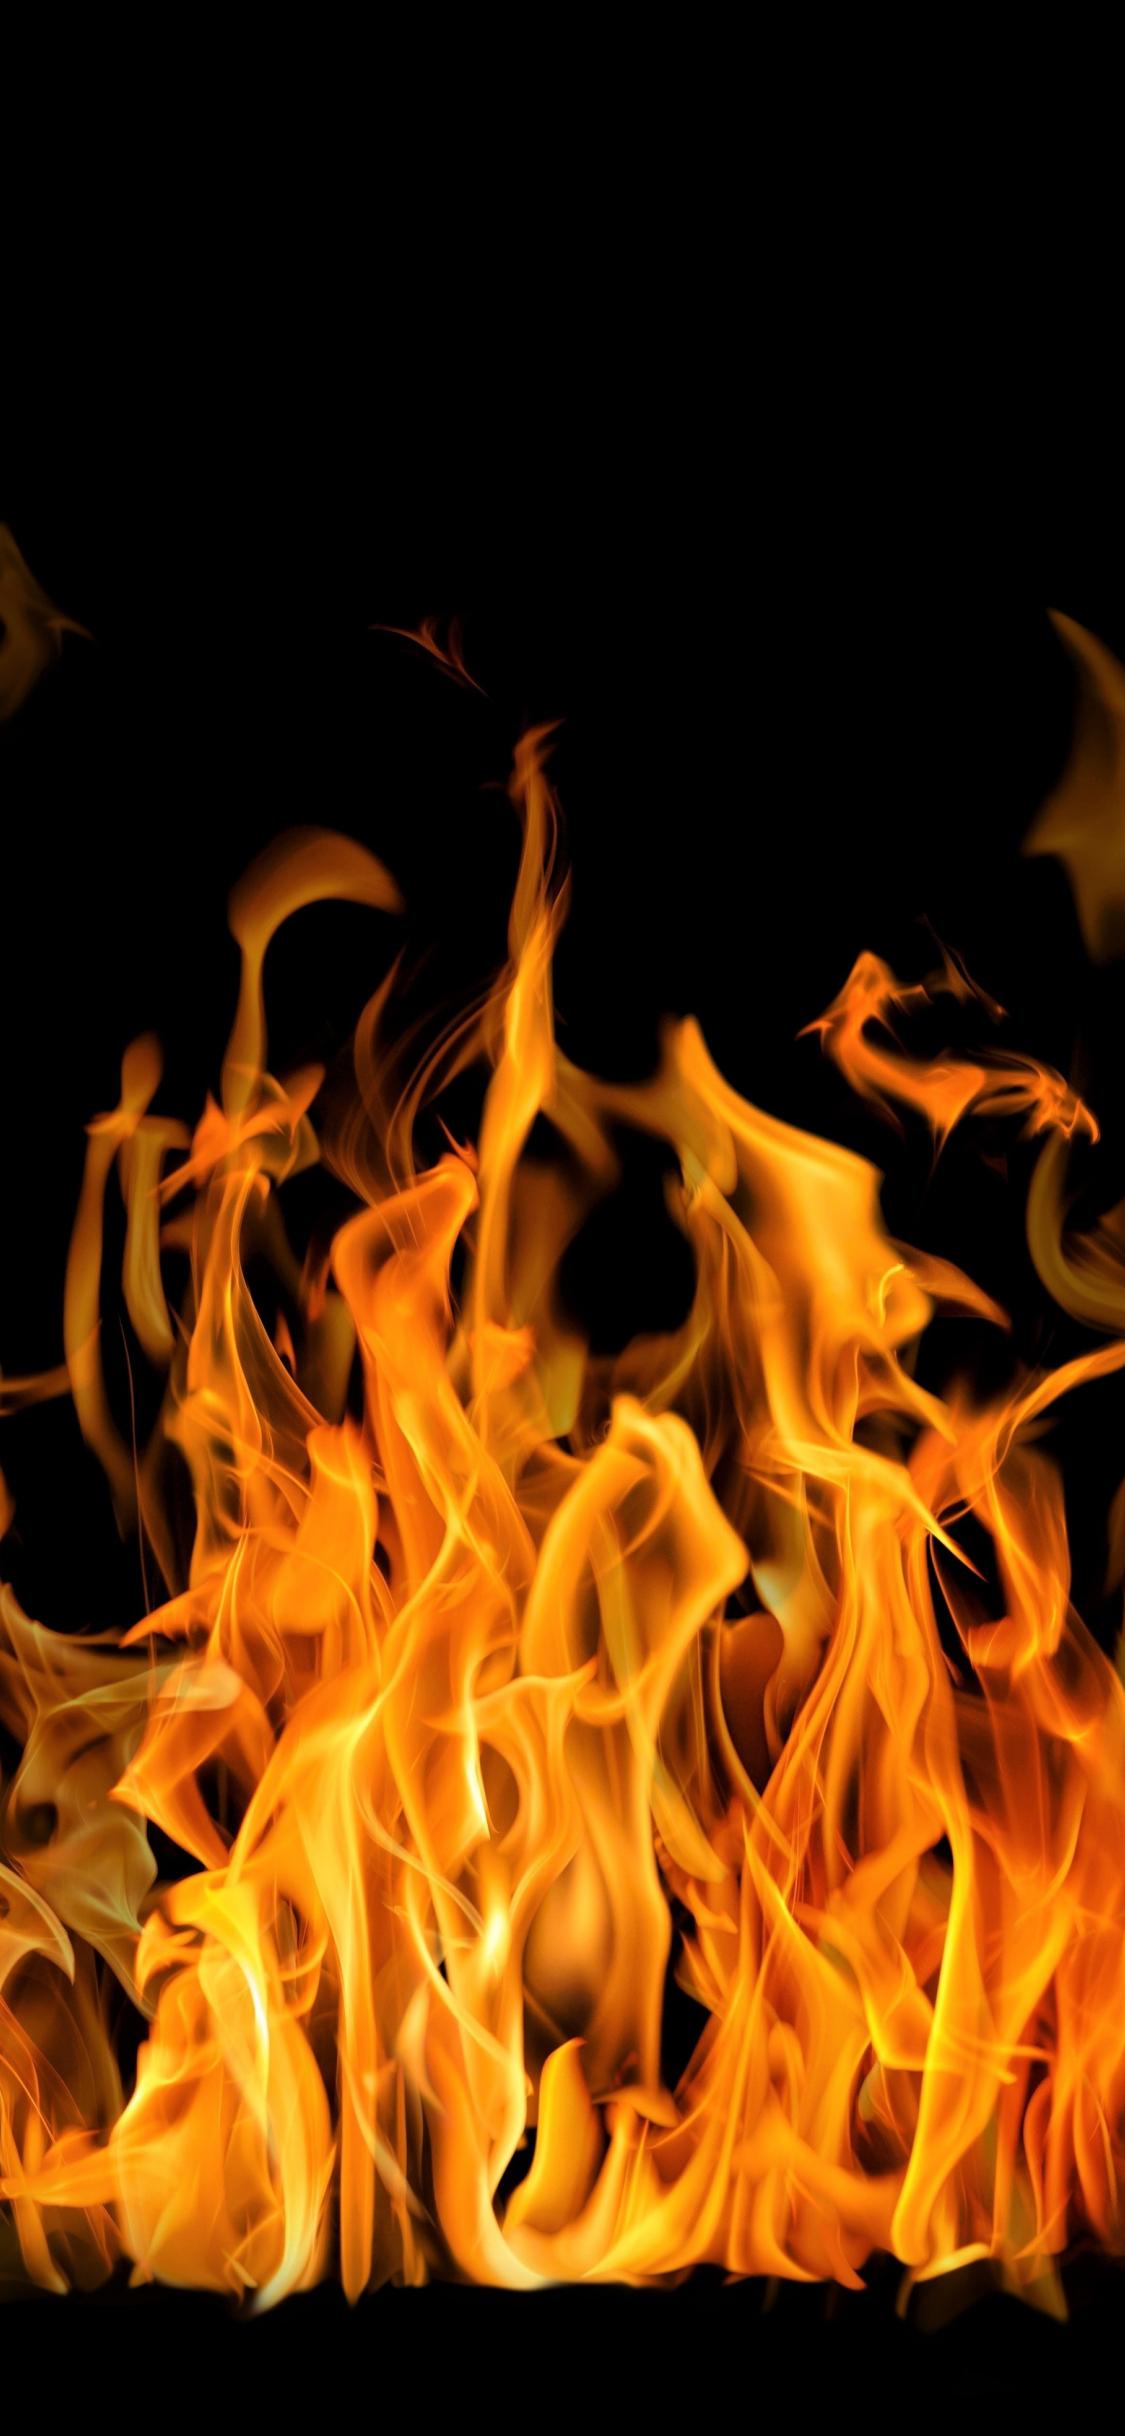 Download 1125x2436 Wallpaper Fire Flames Dark Iphone X